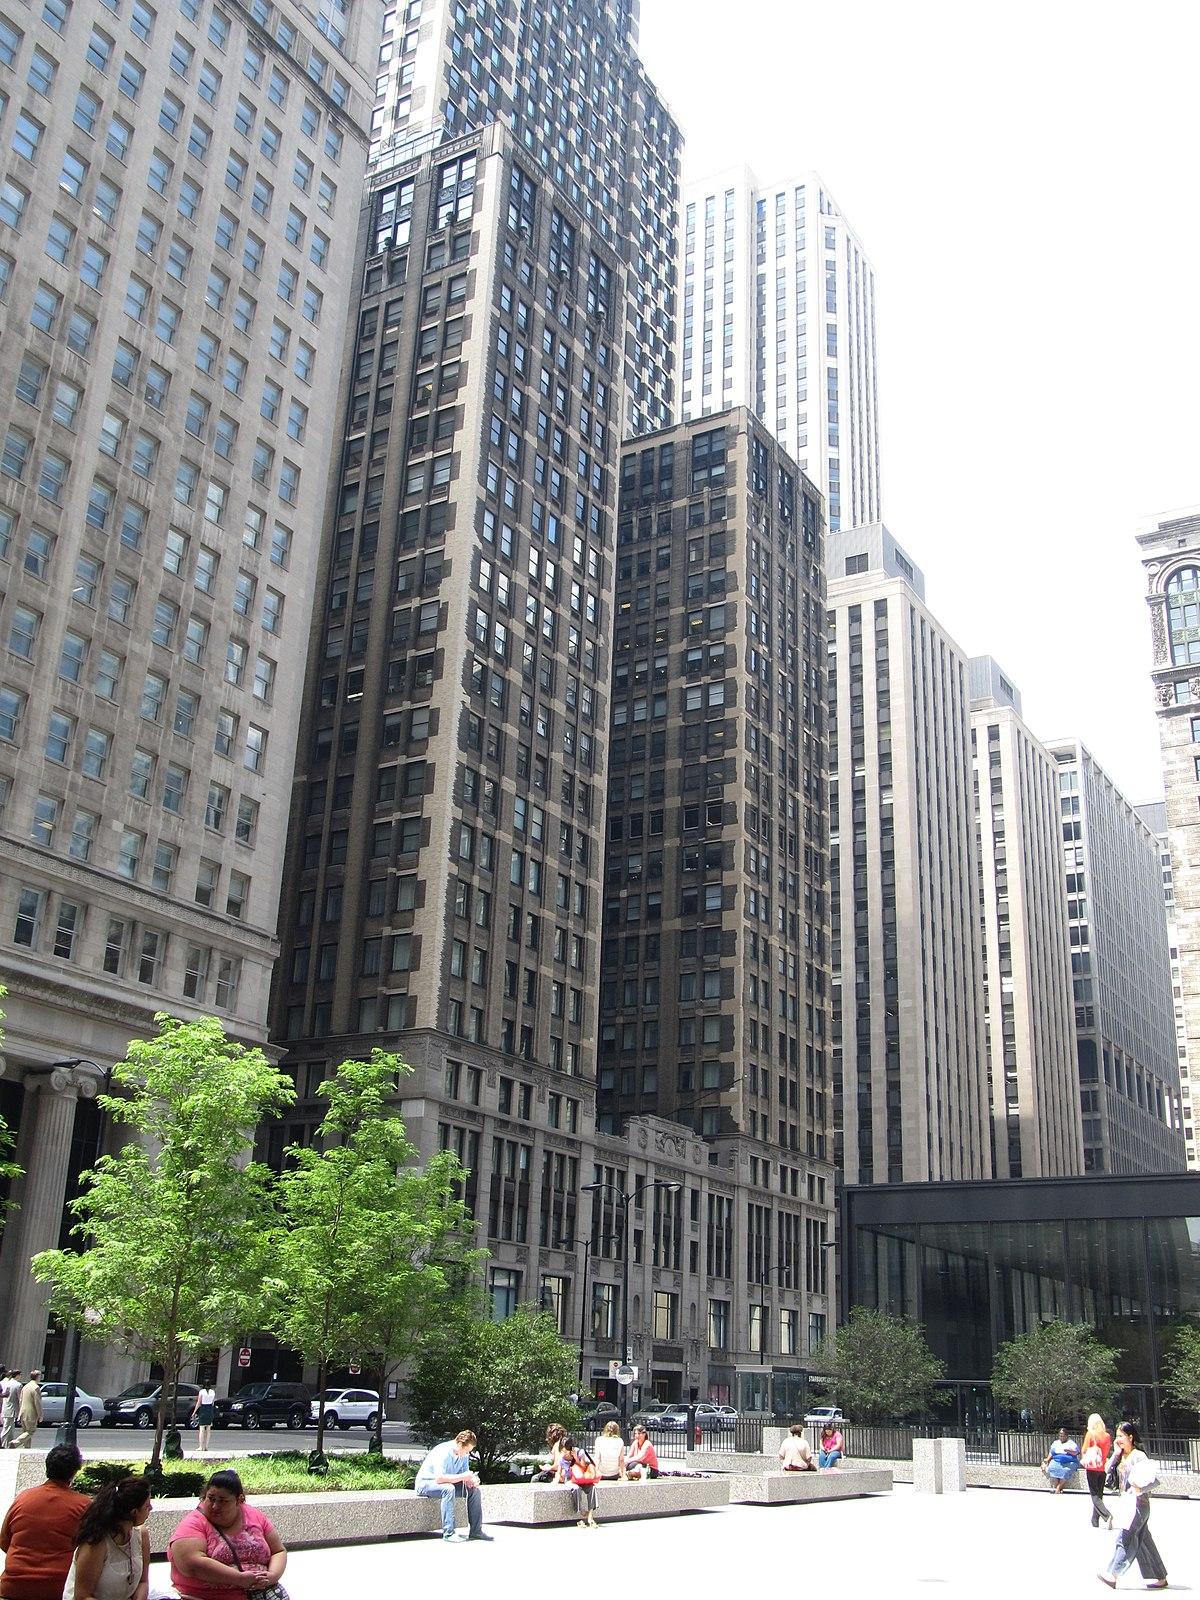 Field Building (Chicago) - Wikipedia